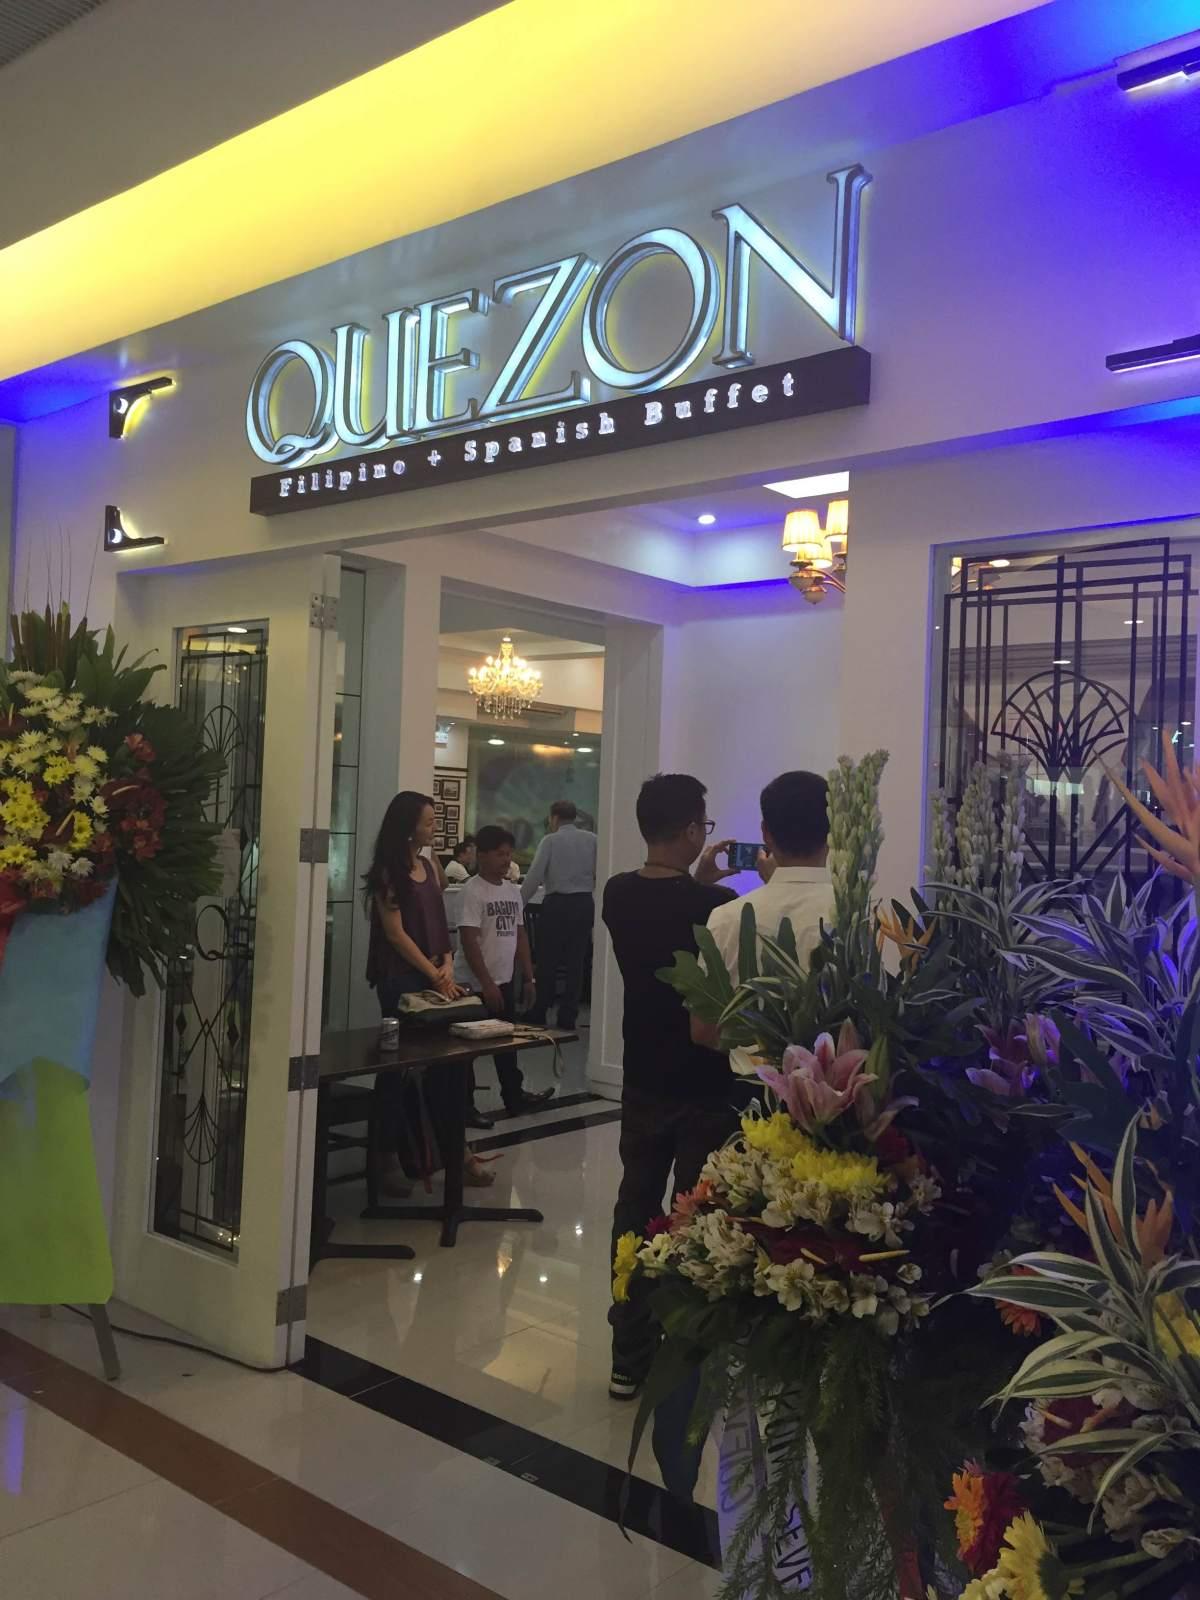 Quezon Buffet – Best Sisig in theMetro